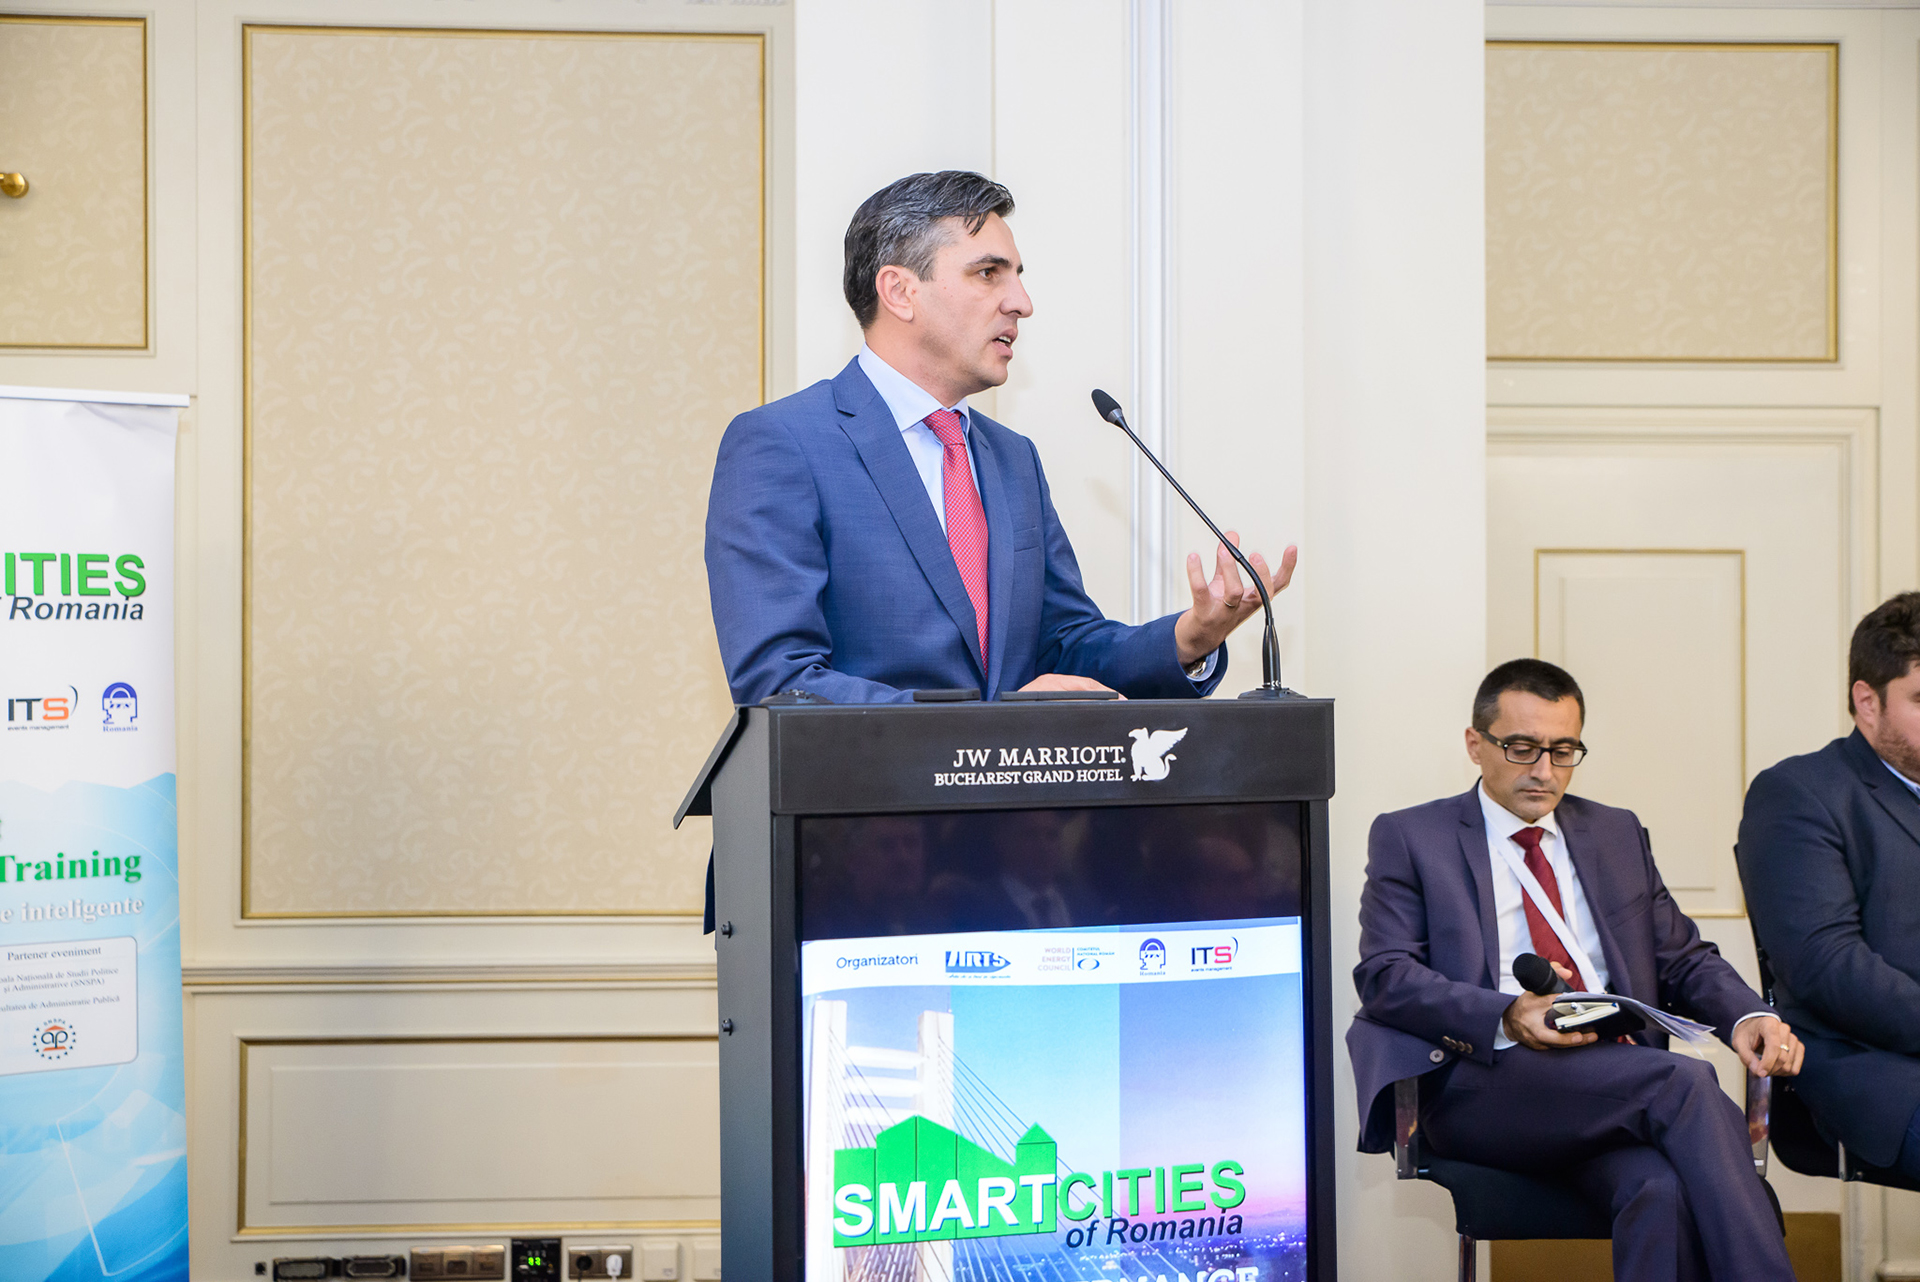 Smart-Cities-Of-Romania-2017---ITS-522